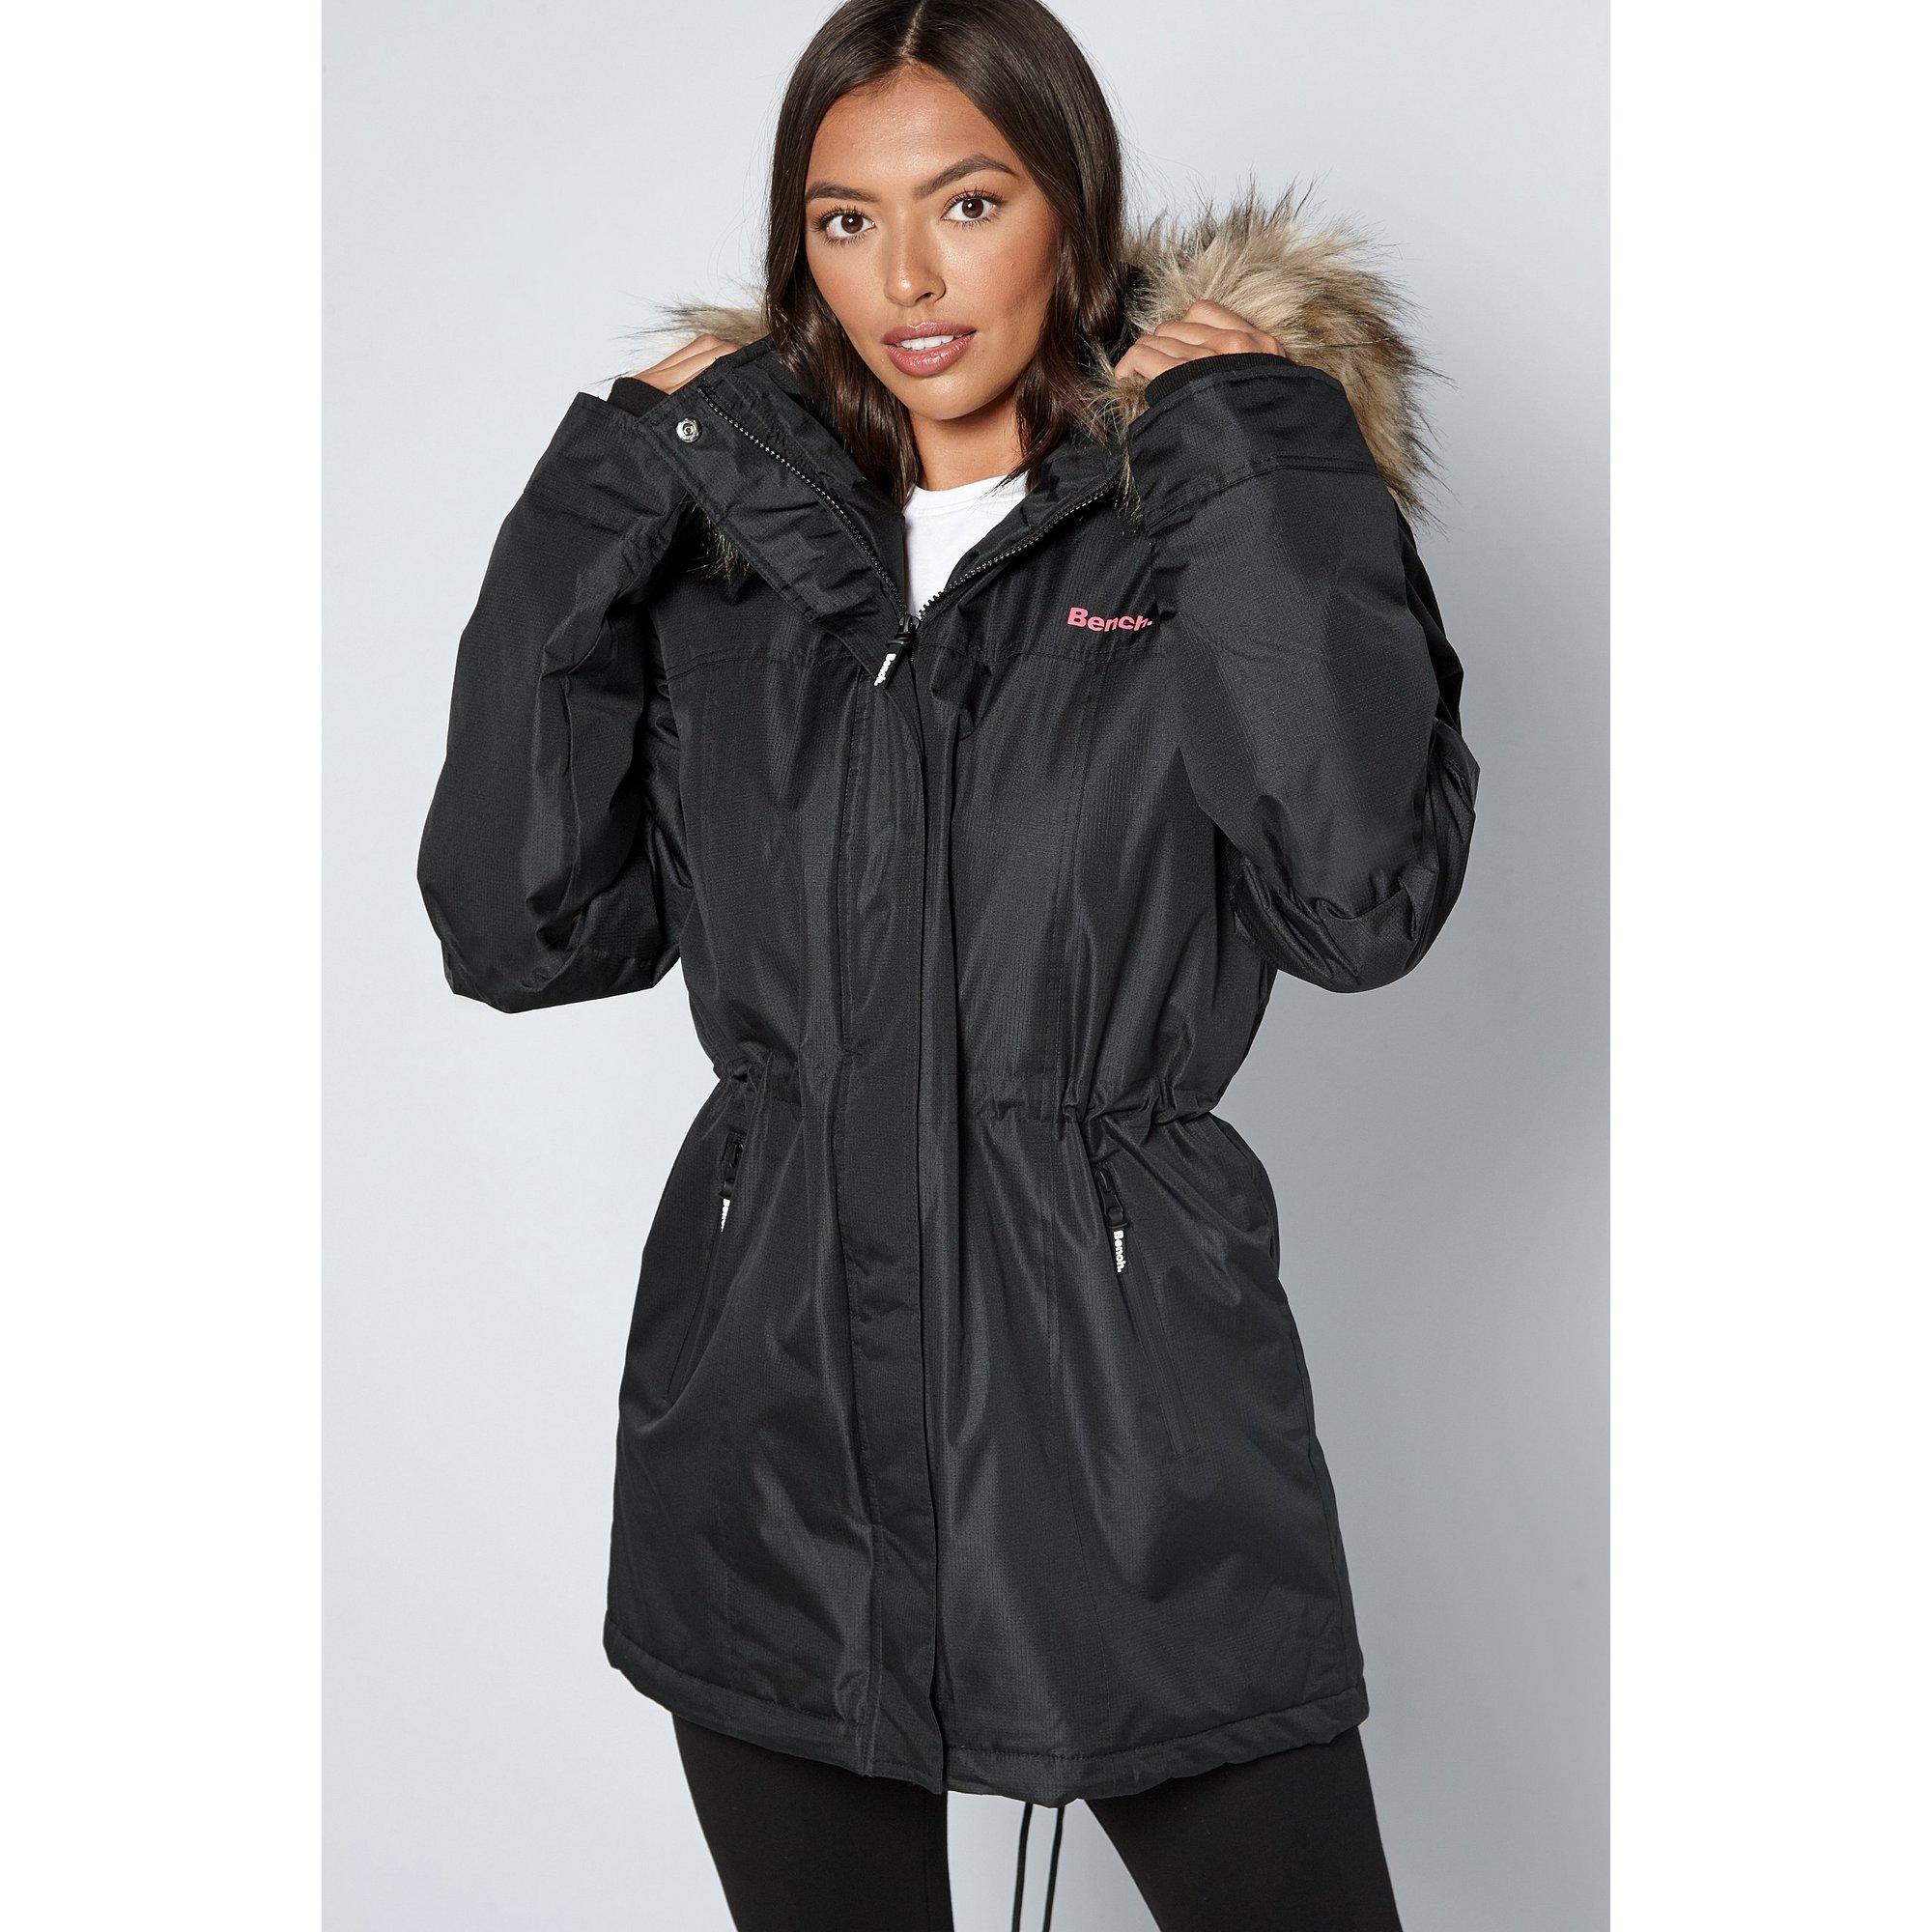 Image of Bench Black Parka with Faux Fur Trim Hood